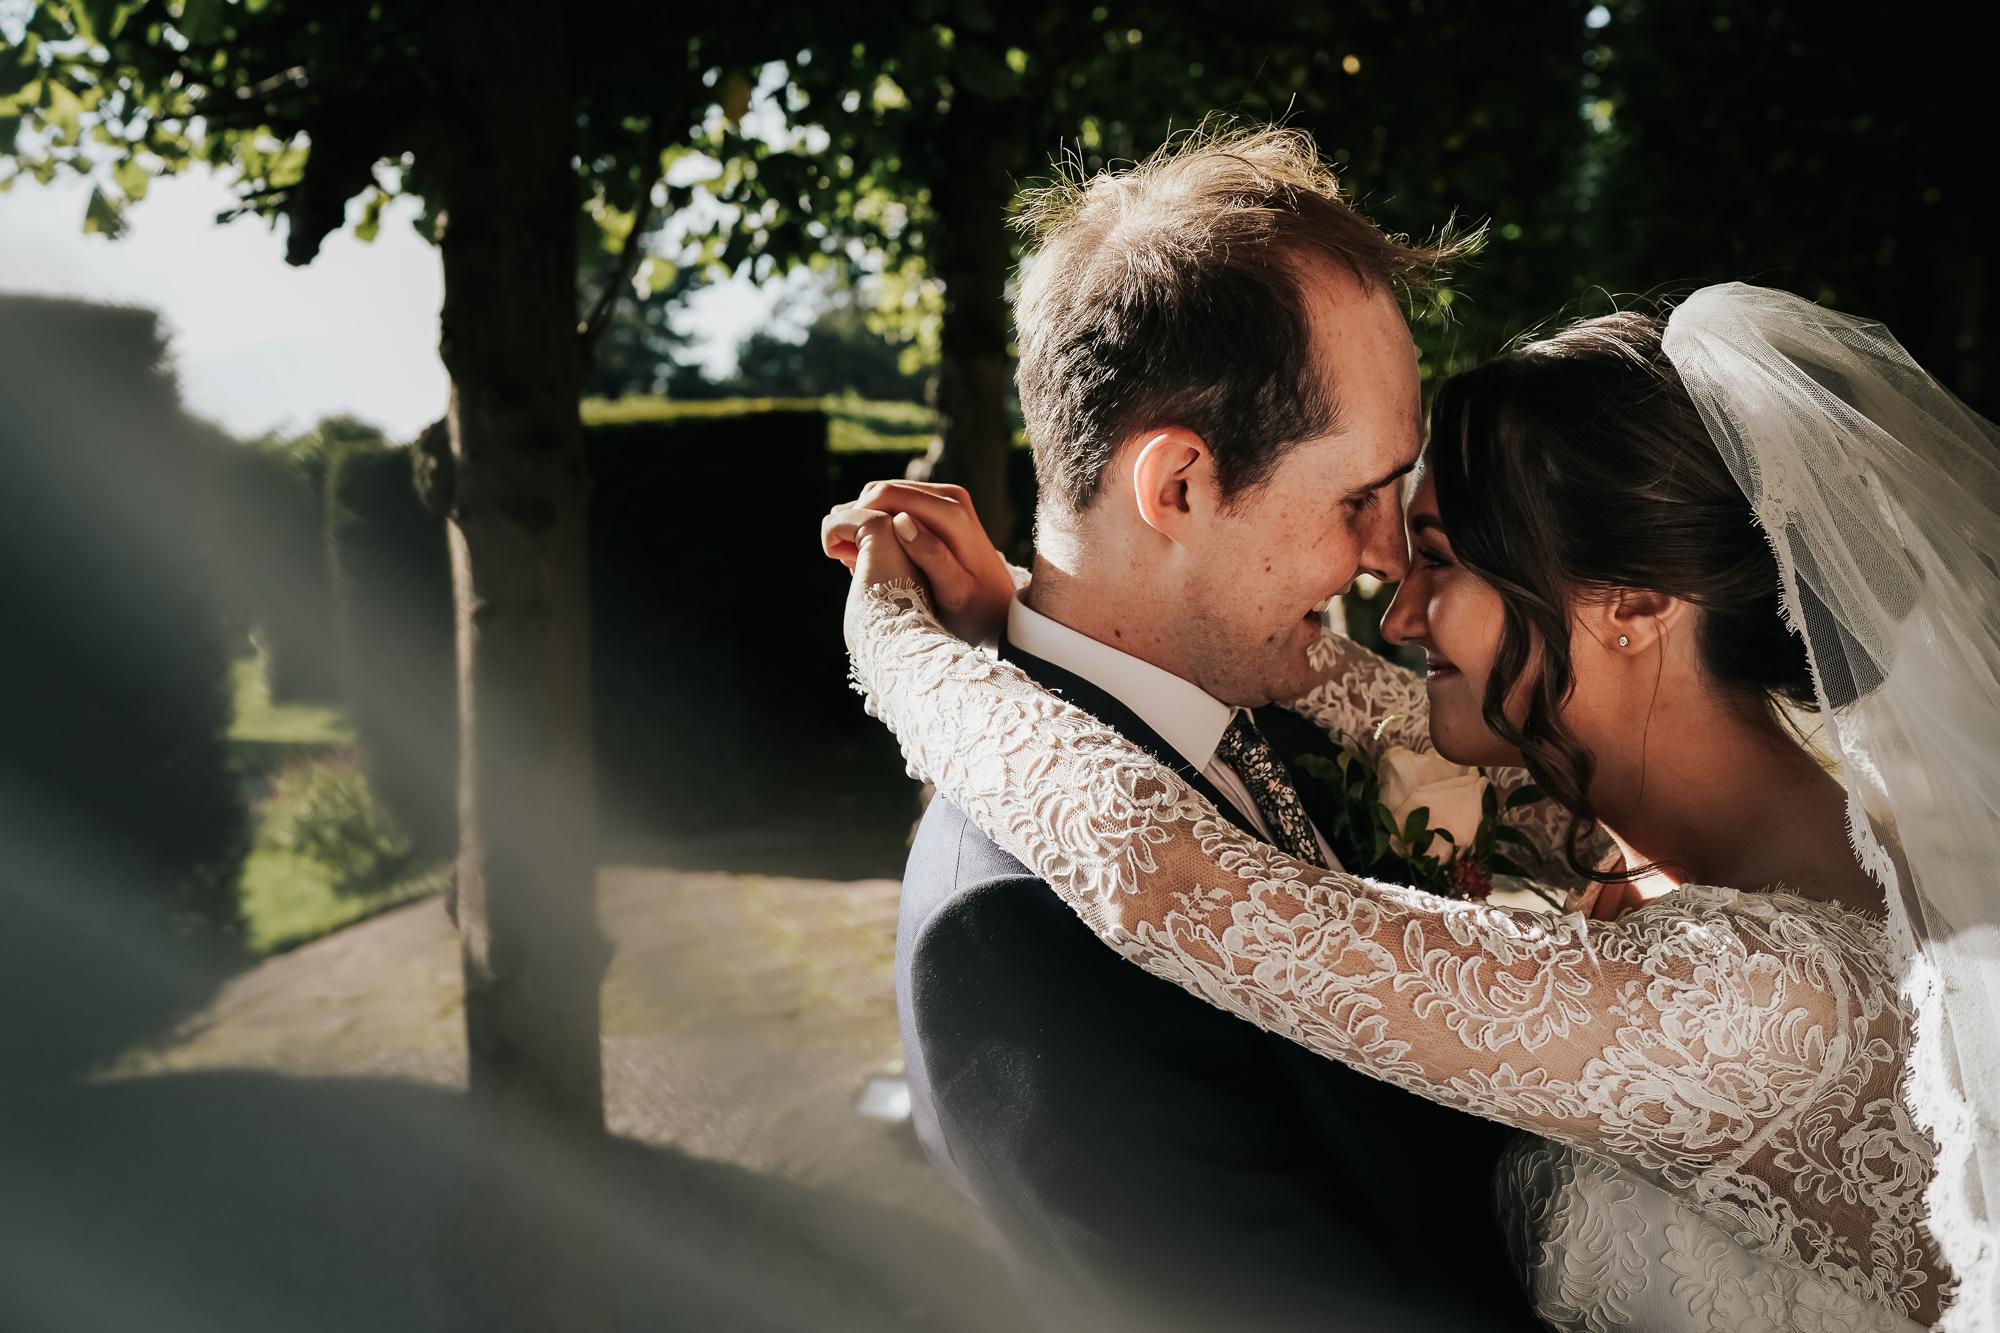 Thornton Manor Cheshire wedding photographer Wedding Photography Cheshire wedding photographer (46 of 64).jpg